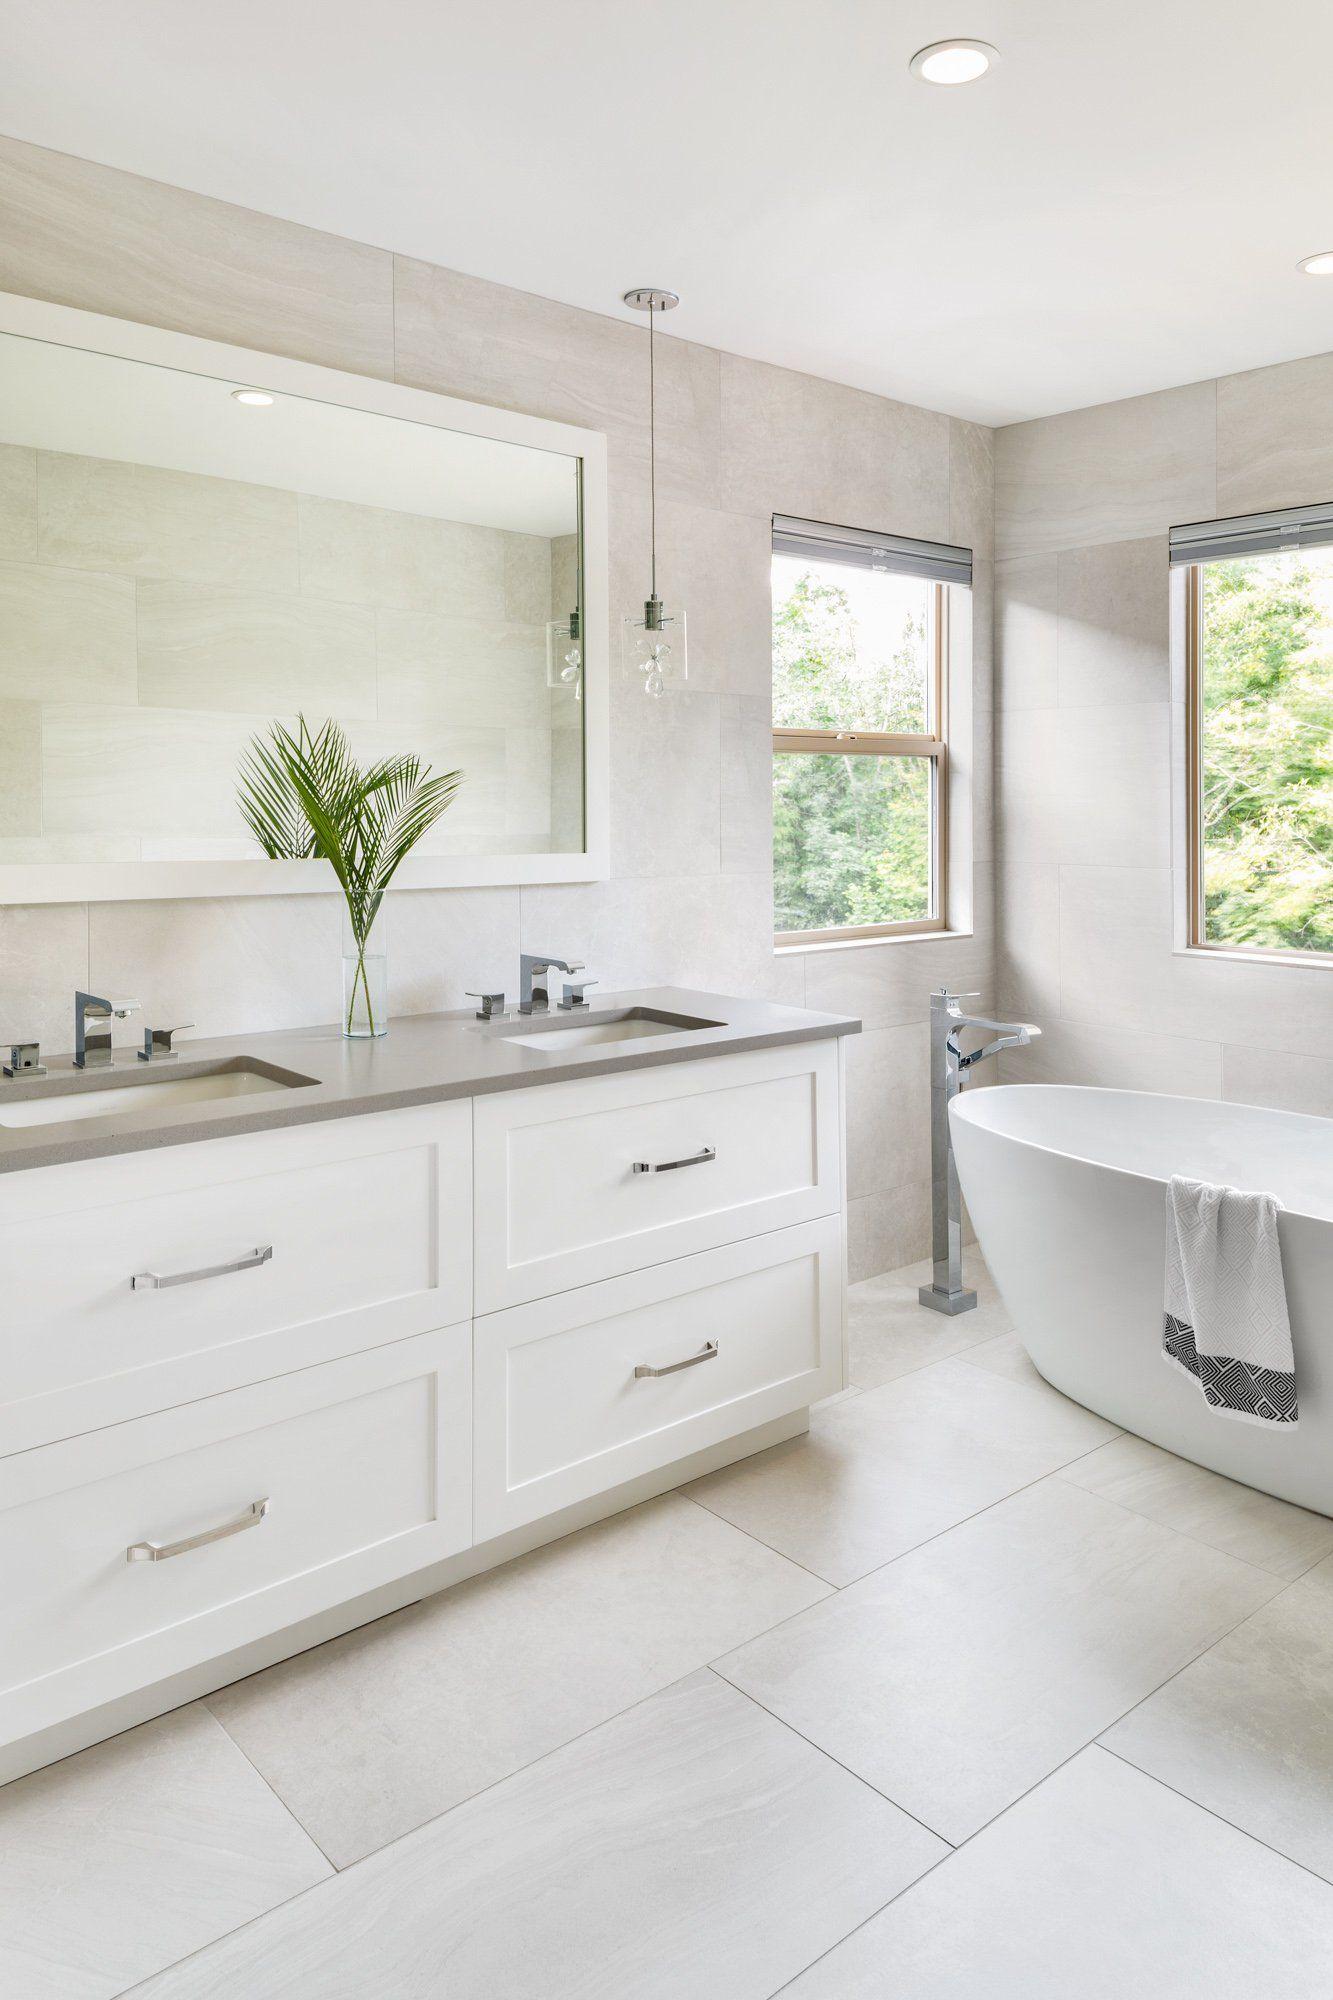 Bathroom Renovations | Vancouver & Coquitlam, BC | Troico